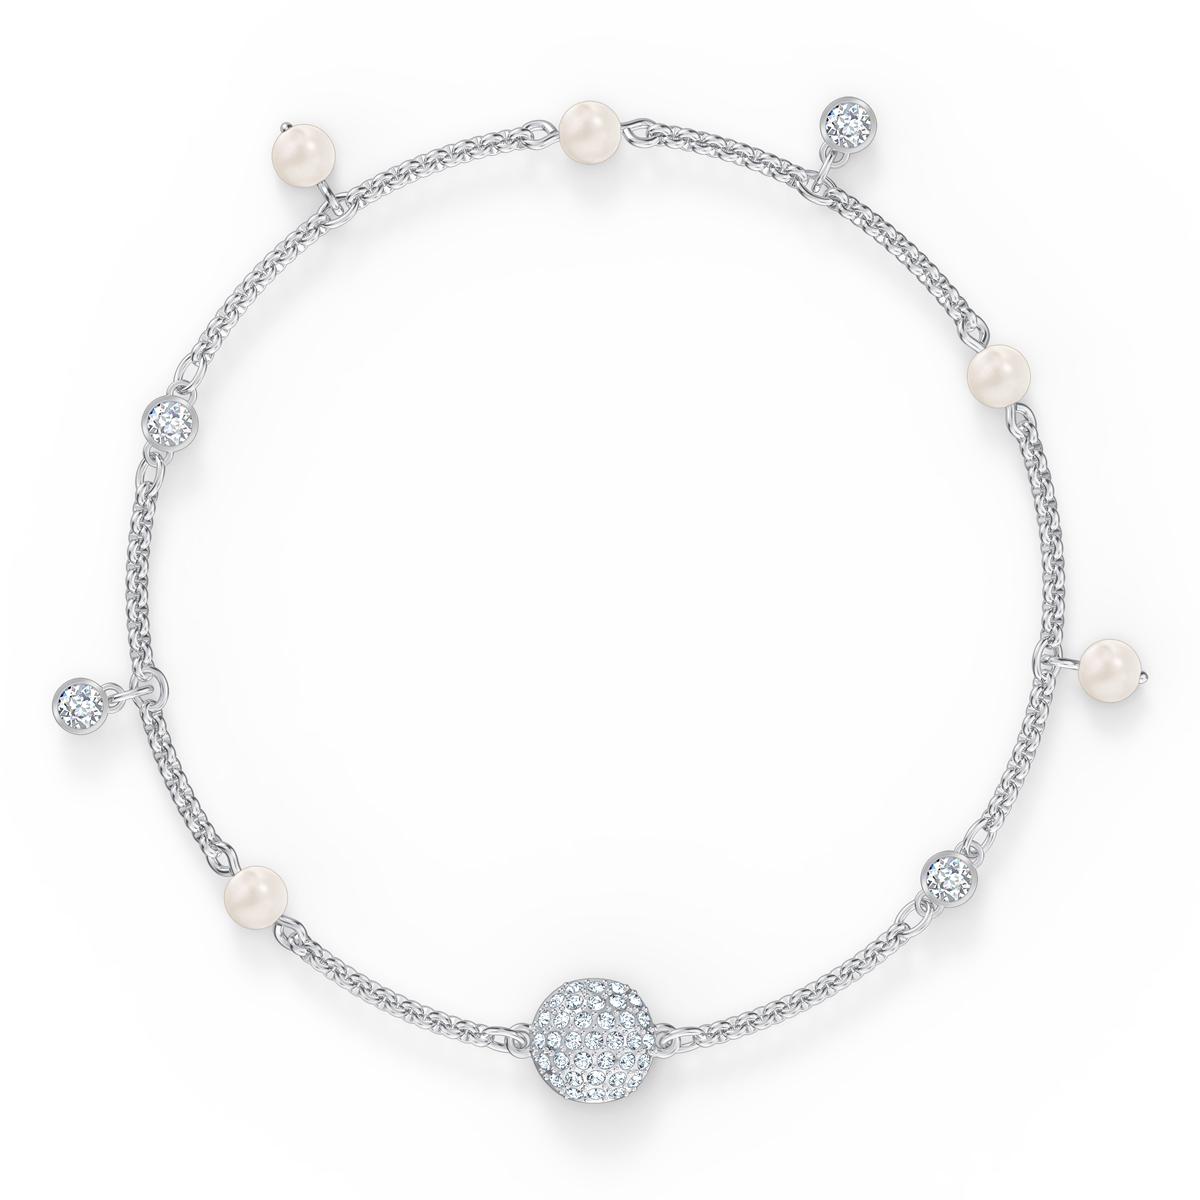 Swarovski Remix Bracelet Delicate Pearl Strand, White, Rhodium Plated